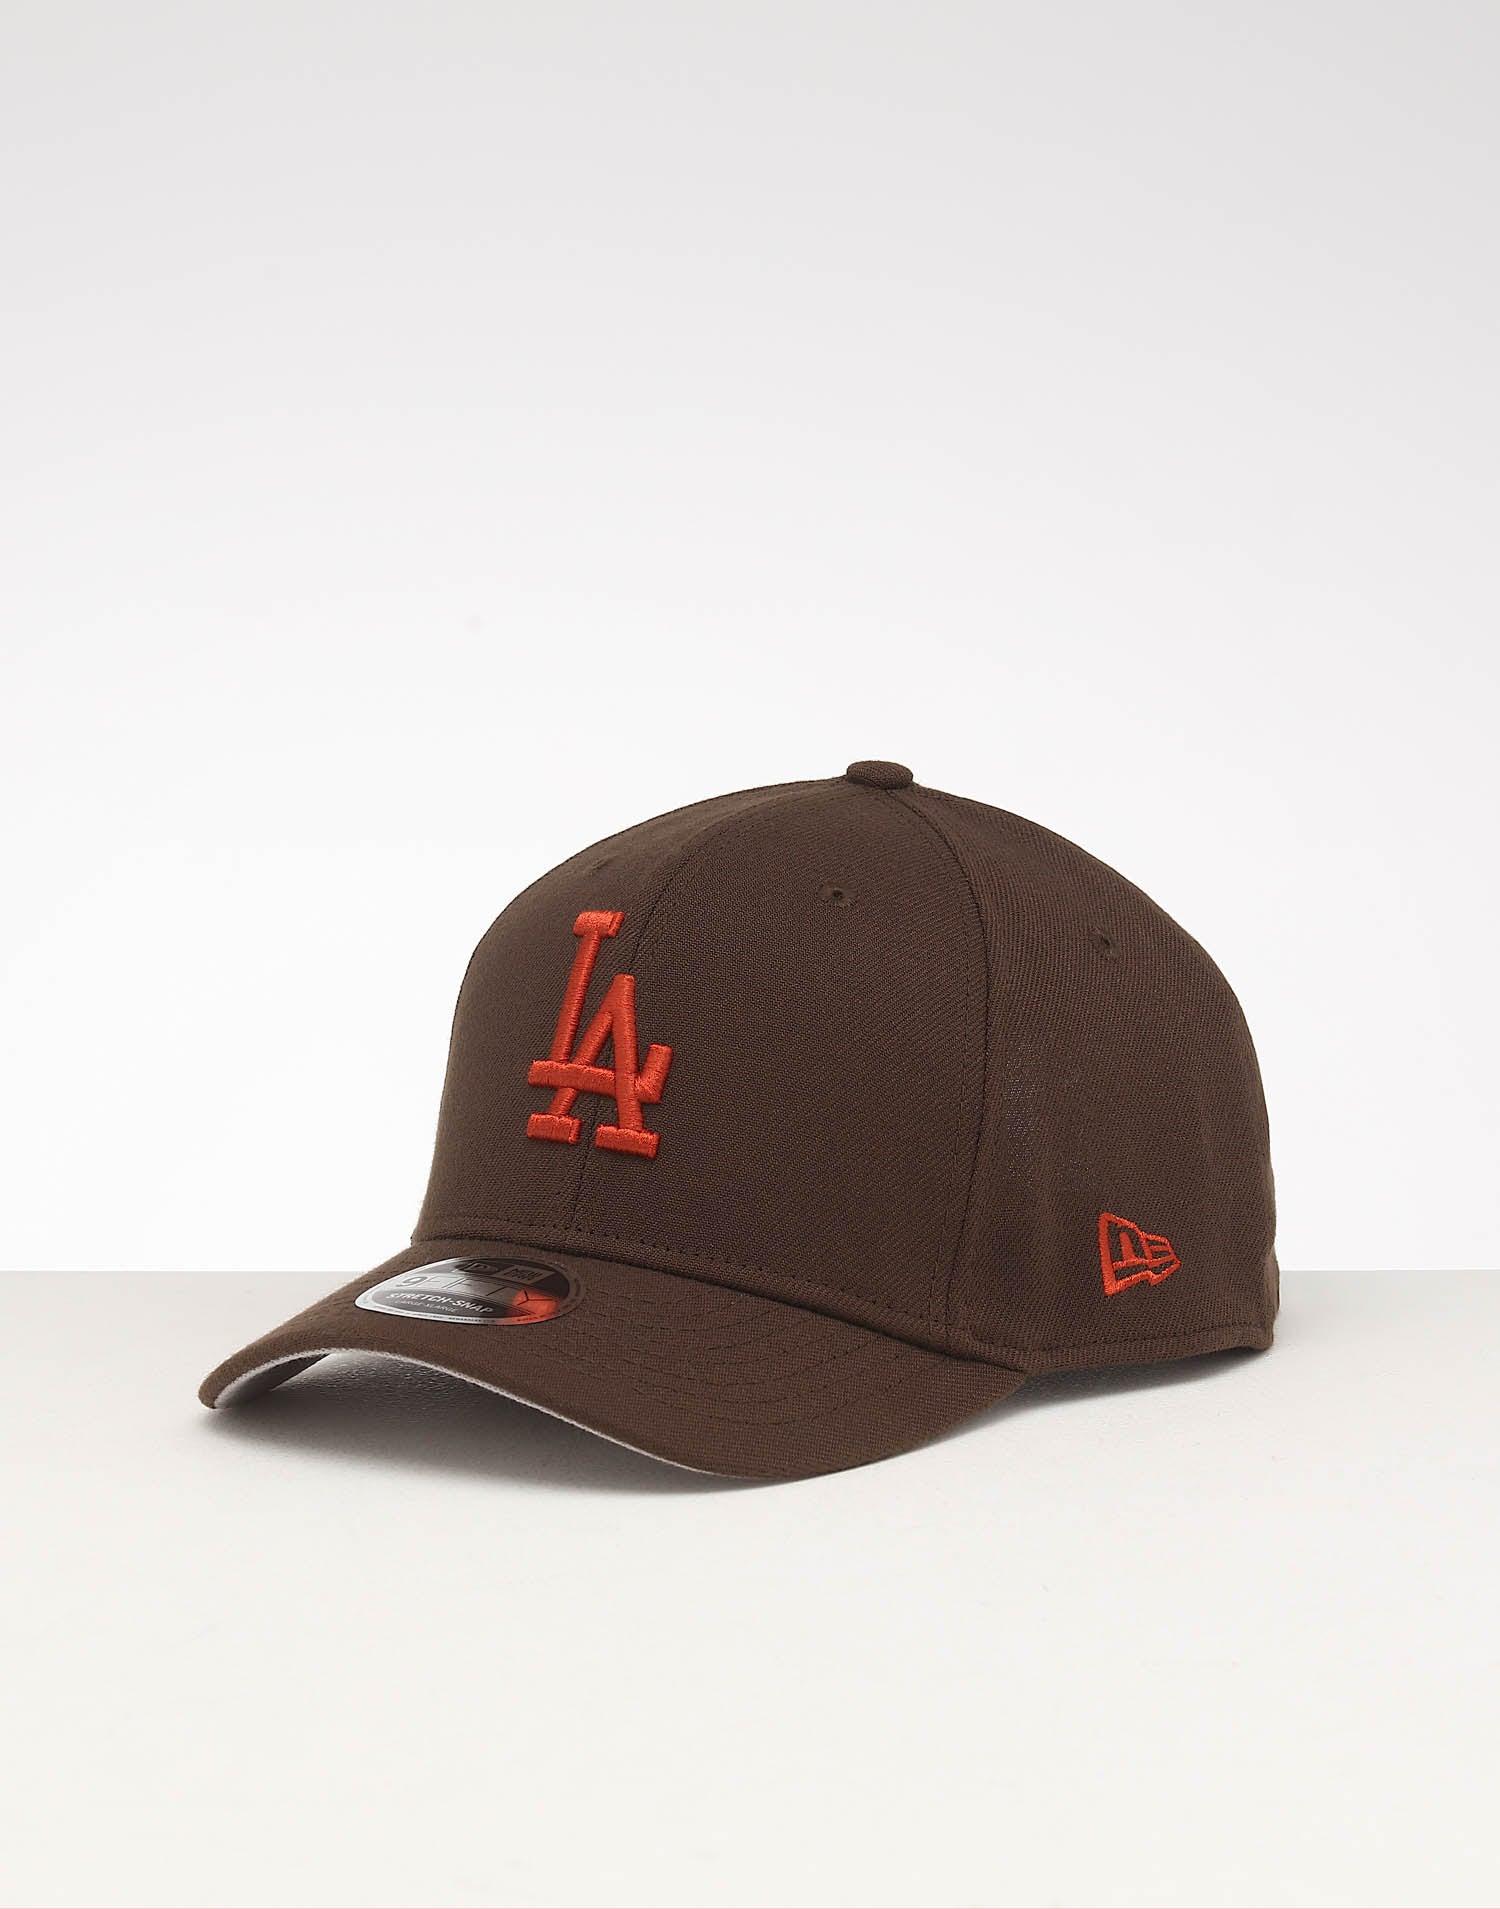 New Era 9Fifty Stretch Snapback Cap Los Angeles Dodgers